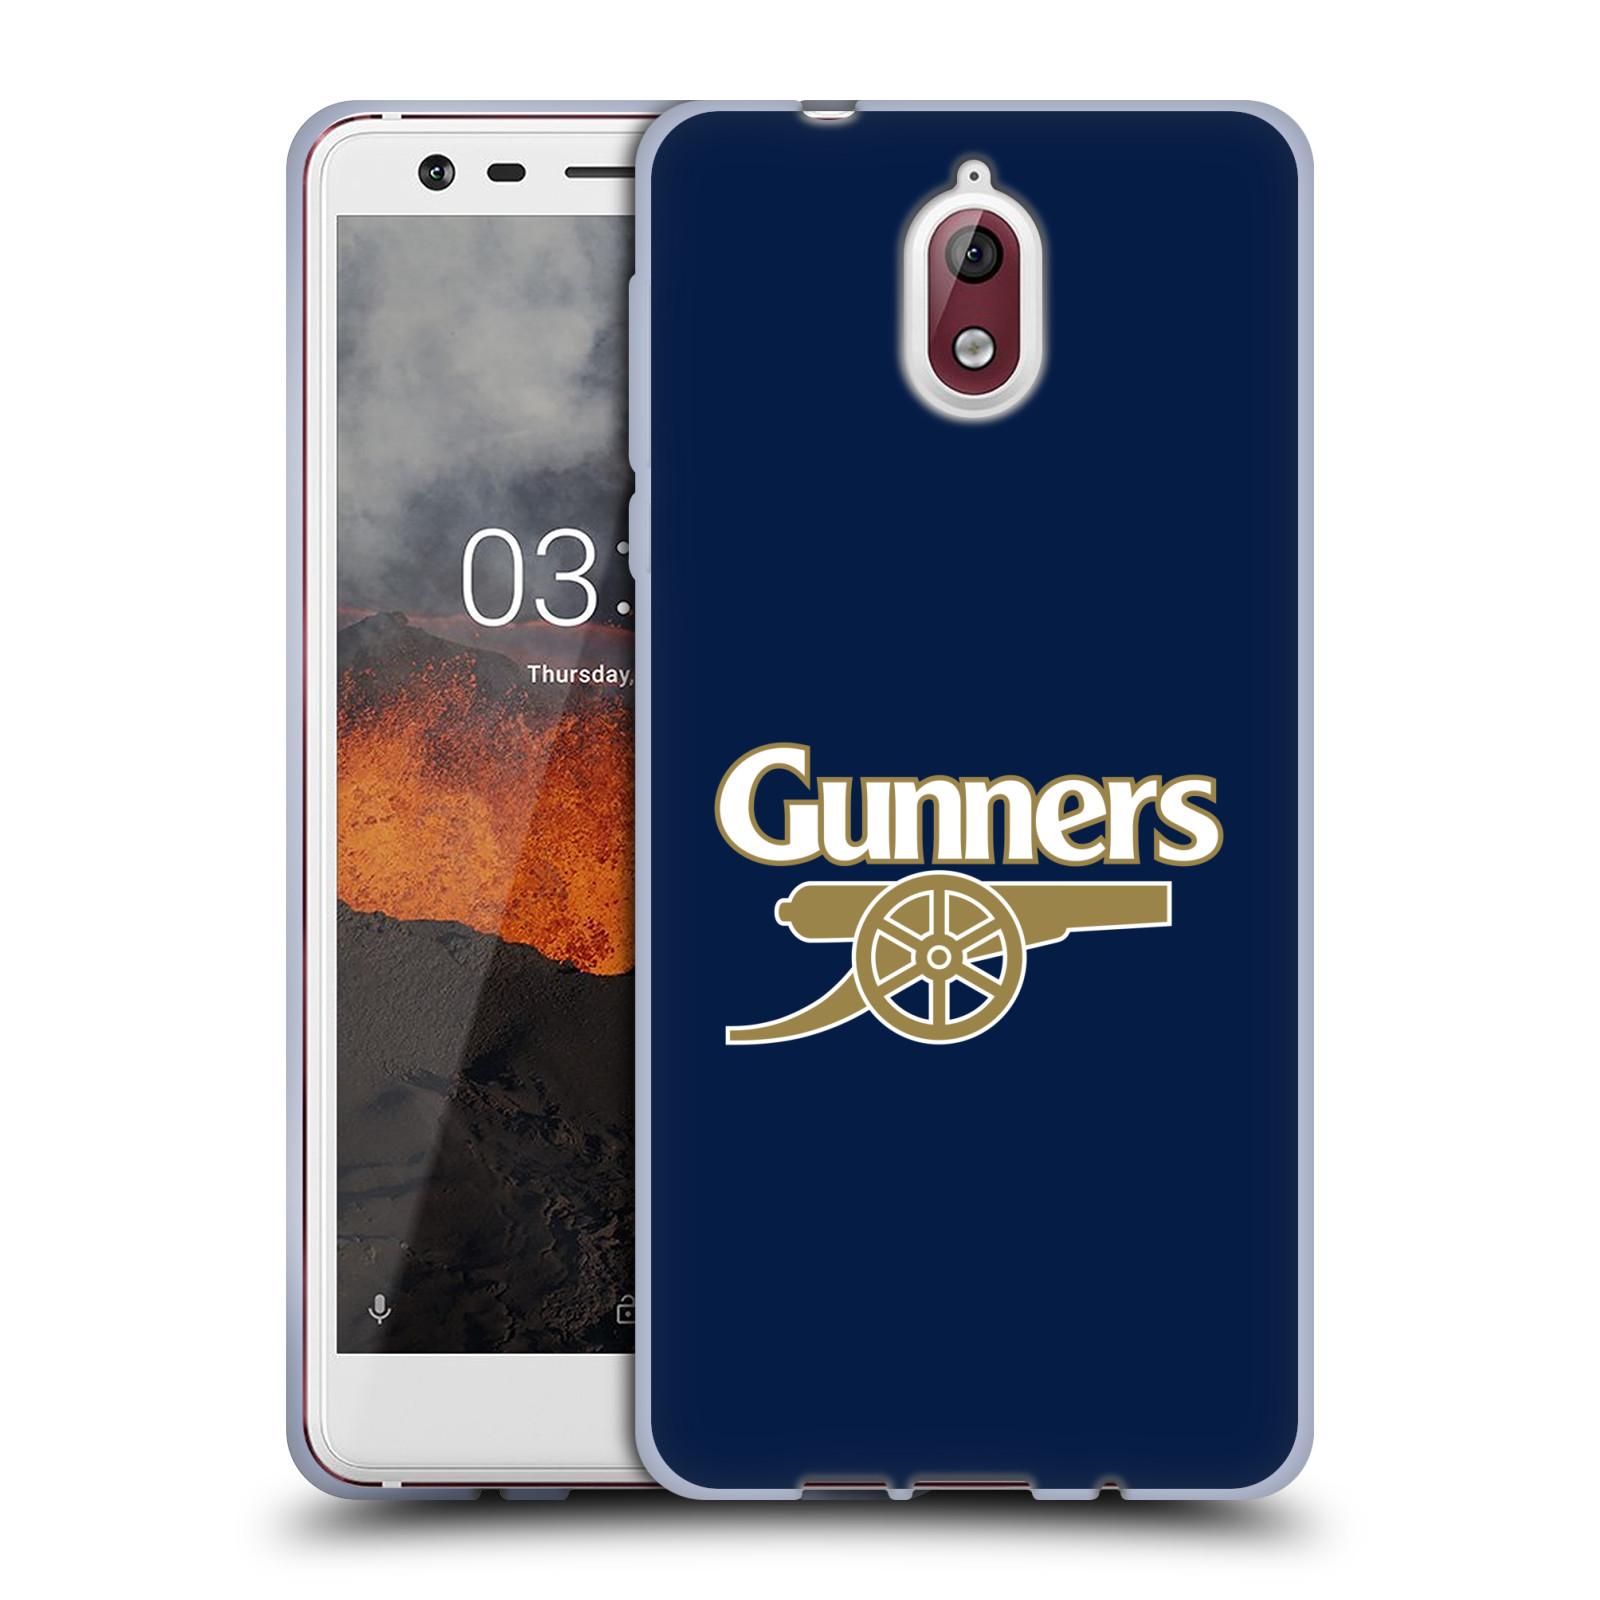 Silikonové pouzdro na mobil Nokia 3.1 - Head Case - Arsenal FC - Gunners